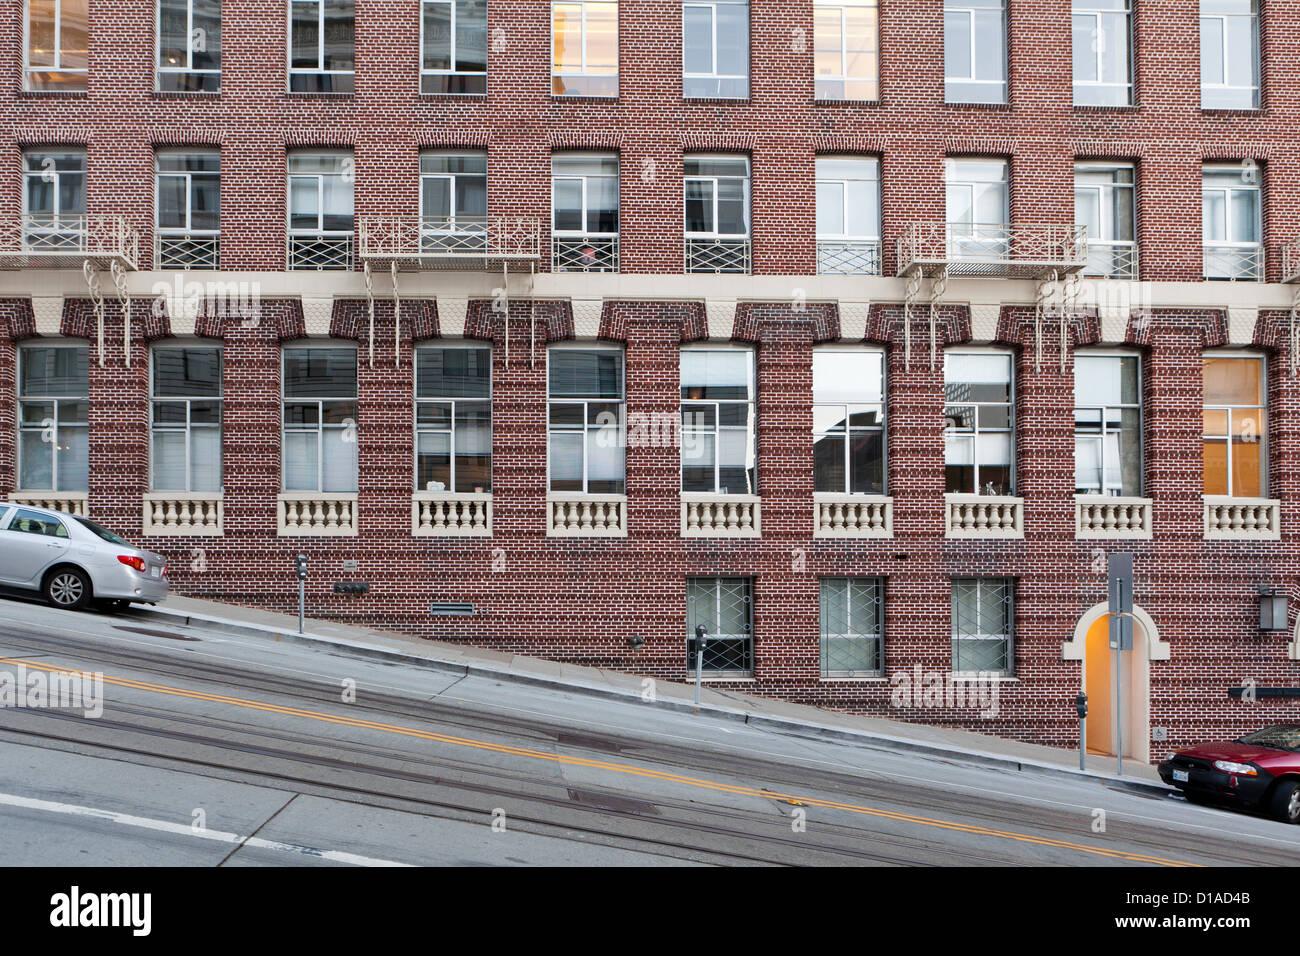 Brick building on heavy sloped street - San Francisco, California USA - Stock Image